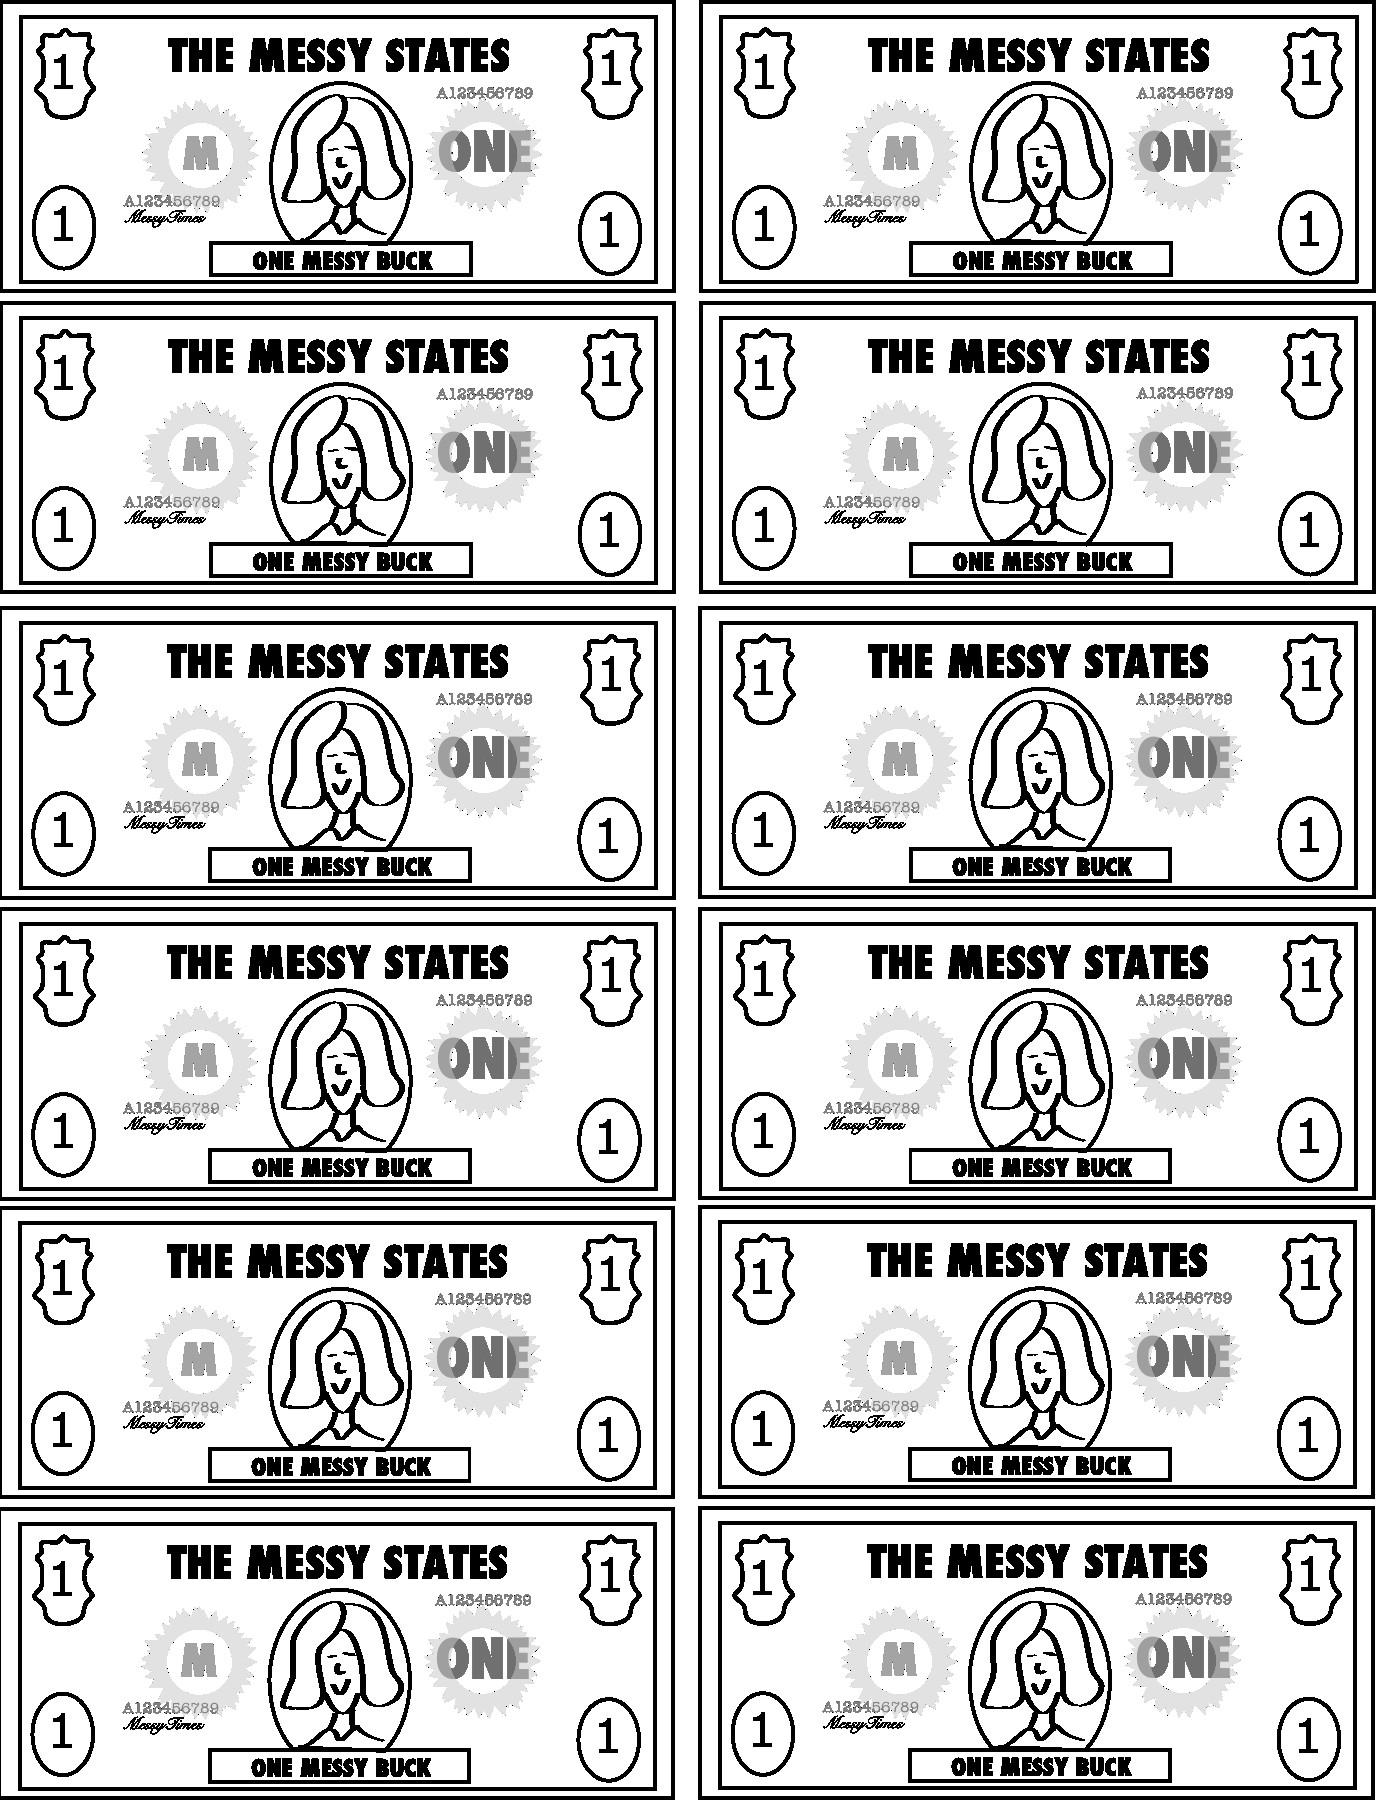 Bible Bucks Template Messy Bucks – Print Your Own Reward Play Money – Messy Times